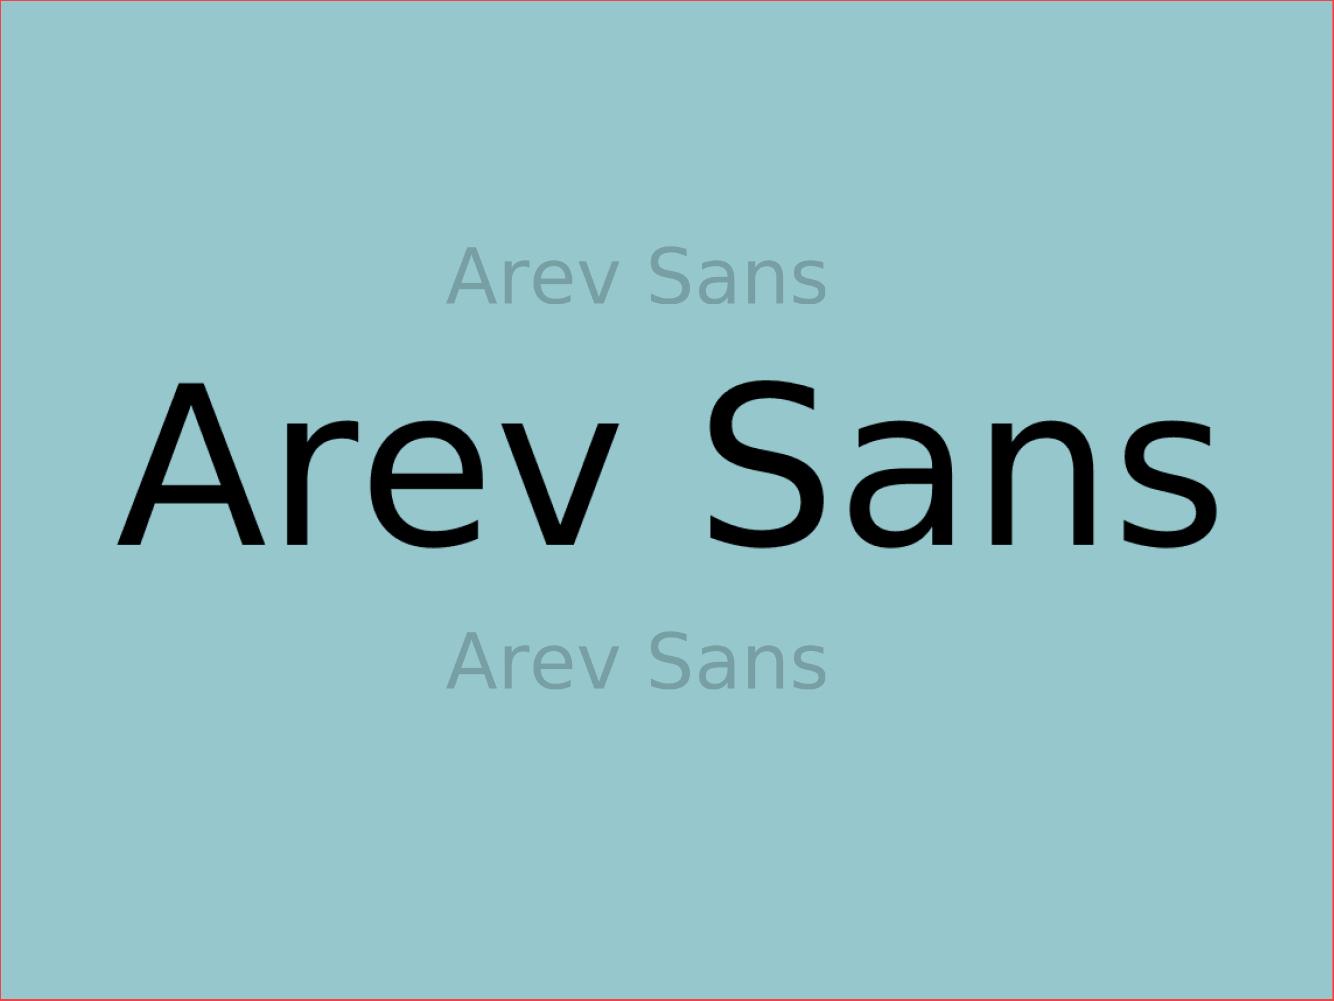 Arev Sans